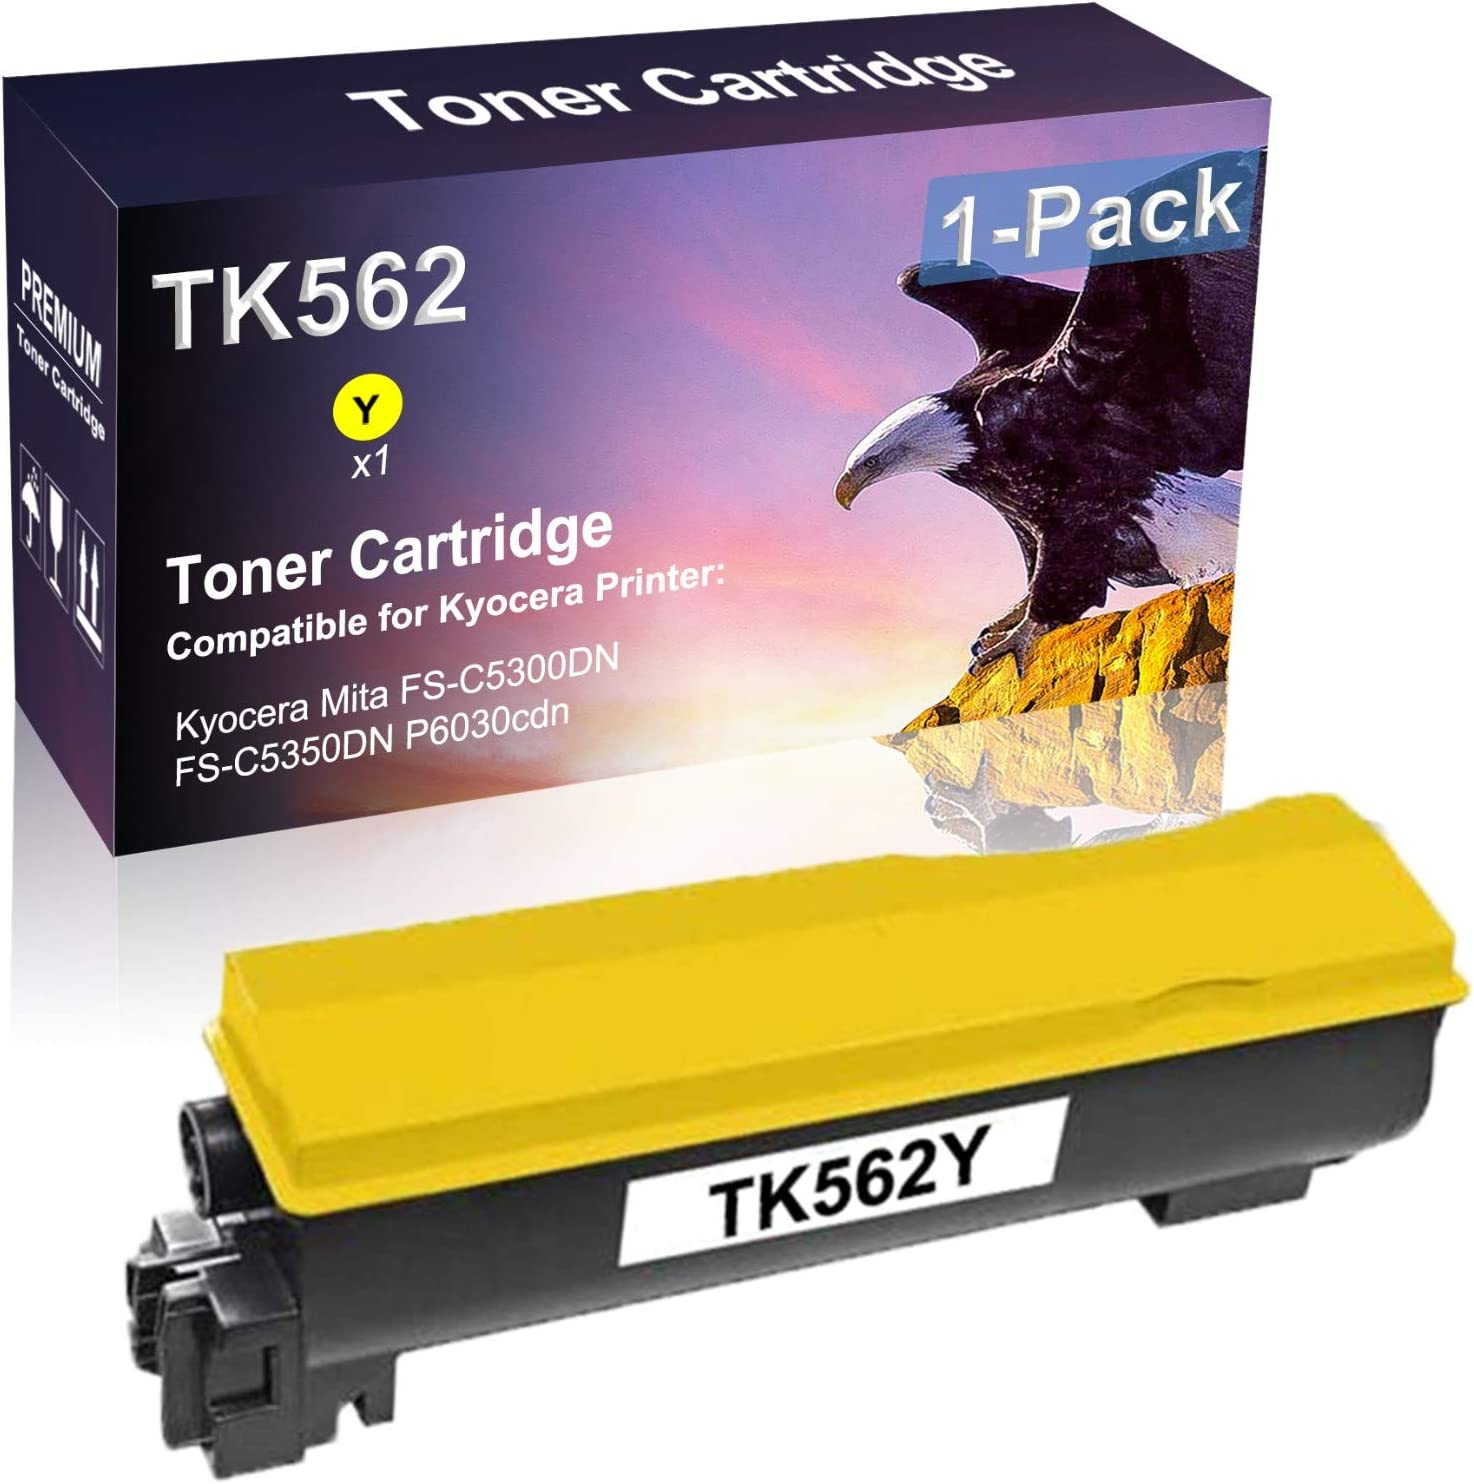 1-Pack (Yellow) Compatible High Yield TK562 | TK562Y Laser Printer Toner Cartridge Used for Kyocera Mita FS-C5300DN FS-C5350DN P6030cdn Printer